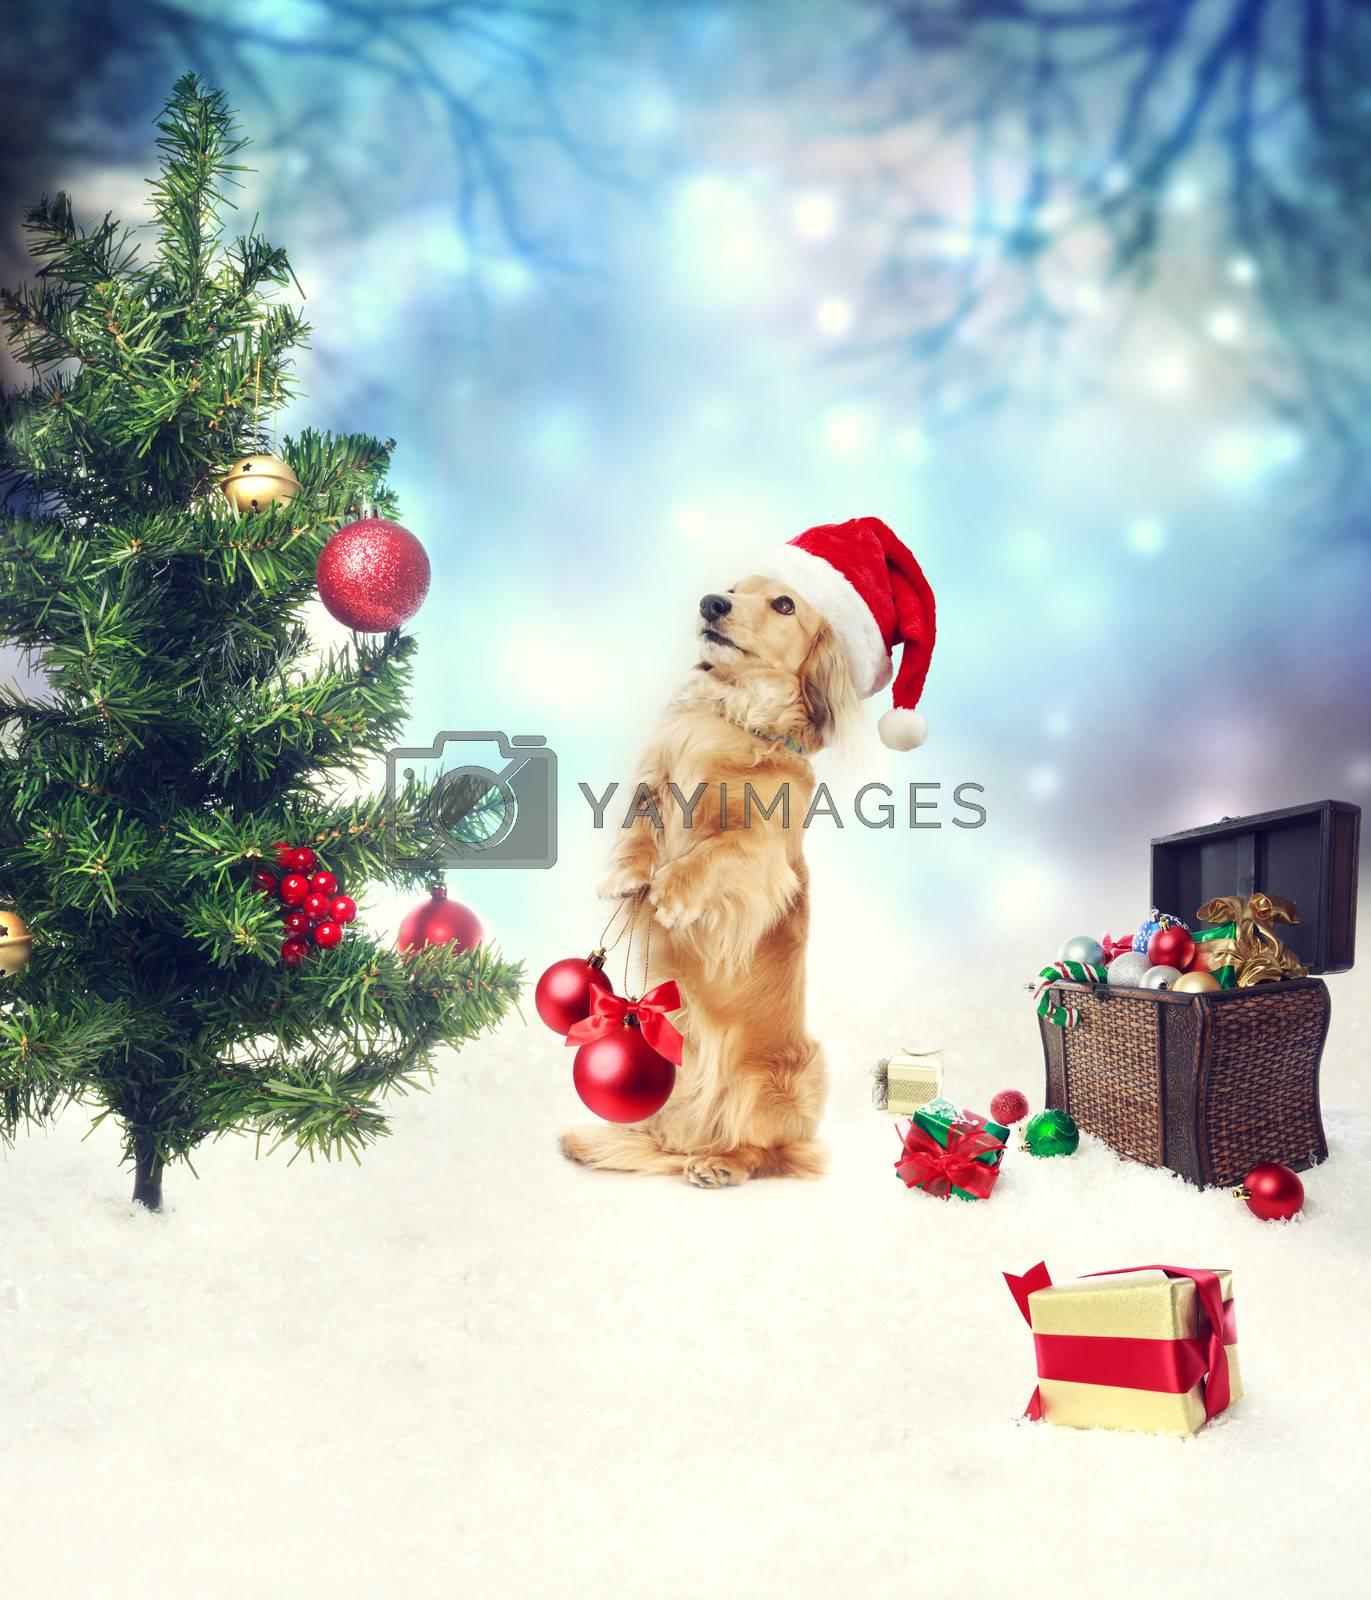 Royalty free image of Dachshund dog decorating christmas tree by melpomene